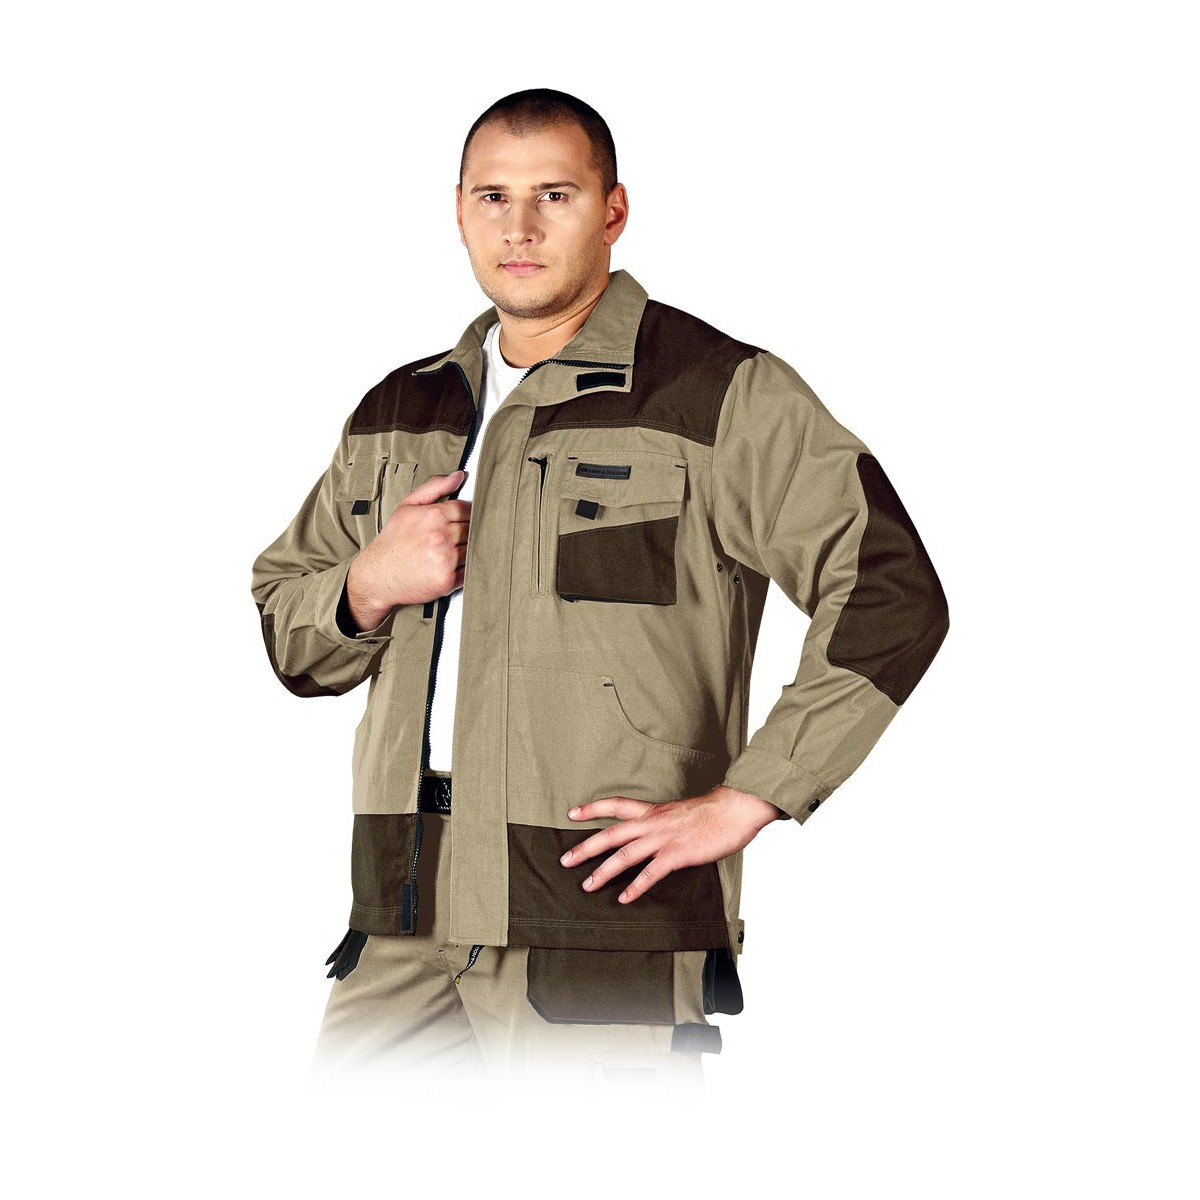 Bluza ochronna Leber & Hollman Formen LH-FMN-J beżowo-brązowa r. S - 3XL